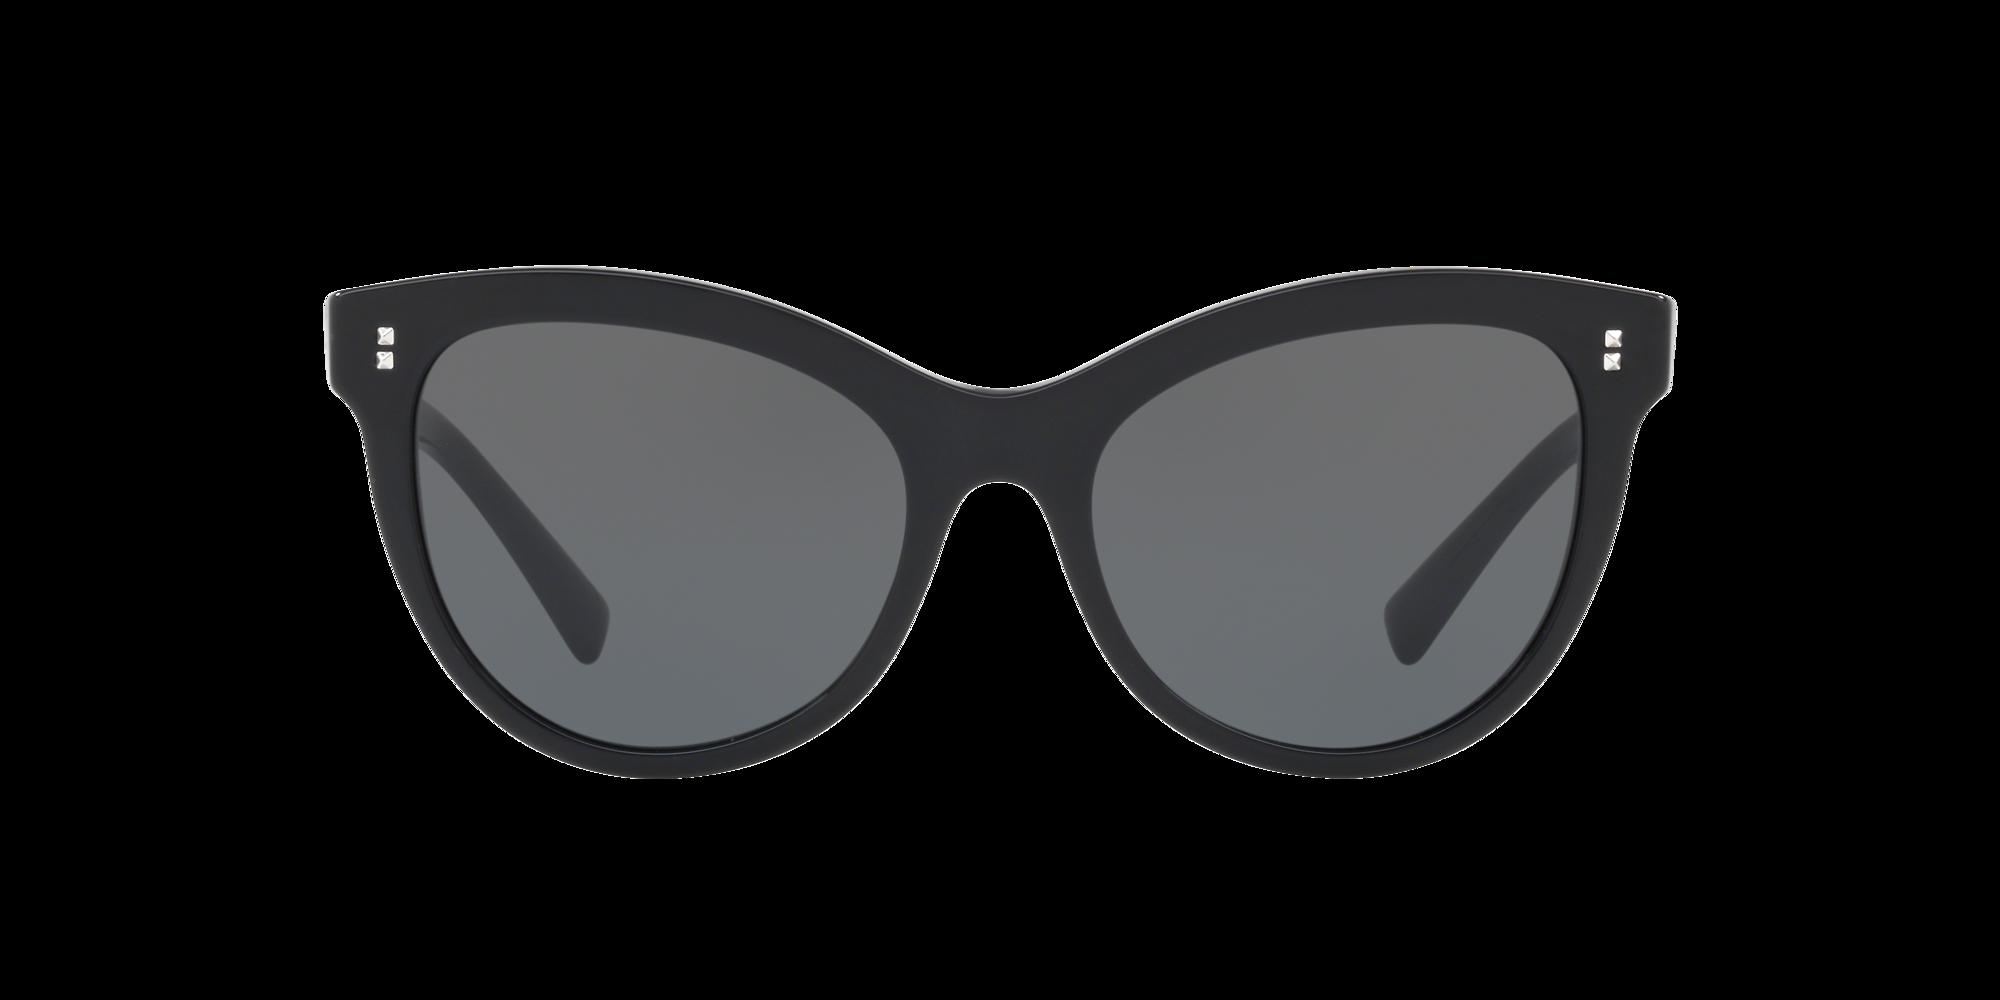 Image for VA4013 54 from LensCrafters | Glasses, Prescription Glasses Online, Eyewear